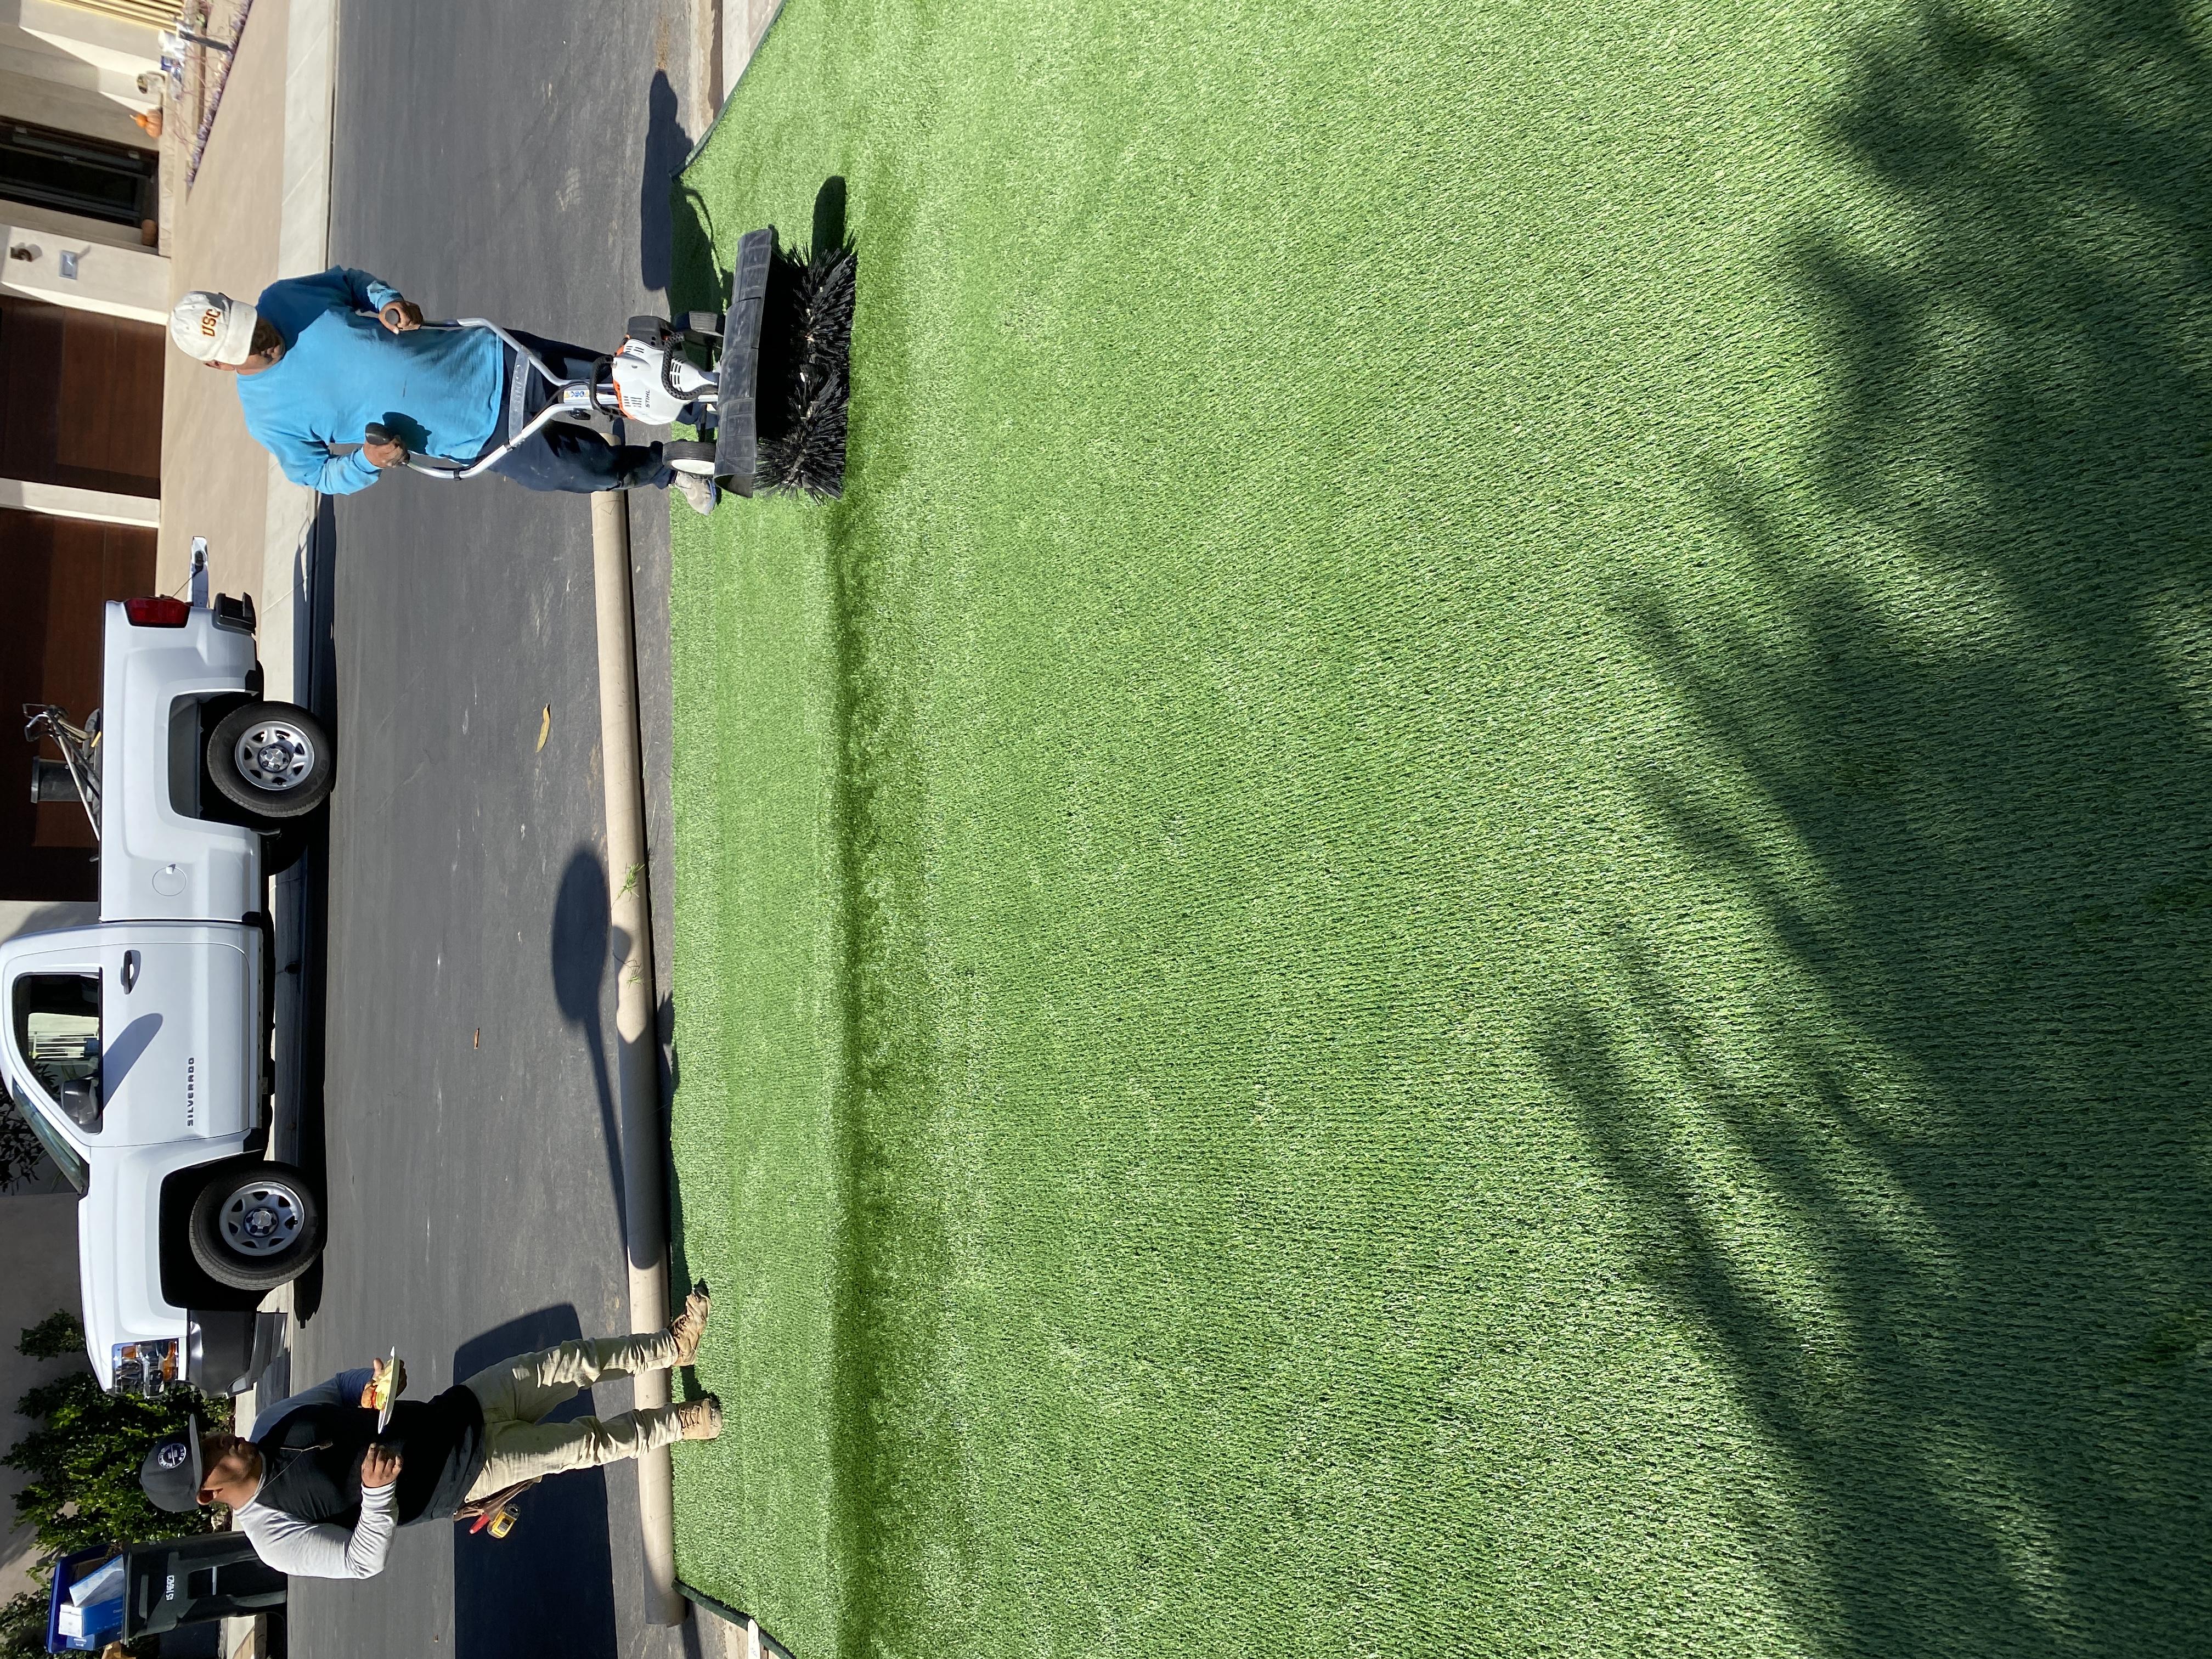 Riviera Monterey-65 fake grass for yard,backyard turf,turf backyard,turf yard,fake grass for backyard,artificial grass,artificial turf,artificial lawn,artificial grass rug,artificial grass installation,artificial grass,fake grass,synthetic grass,grass carpet,artificial grass rug,fake grass for yard,backyard turf,turf backyard,turf yard,fake grass for backyard